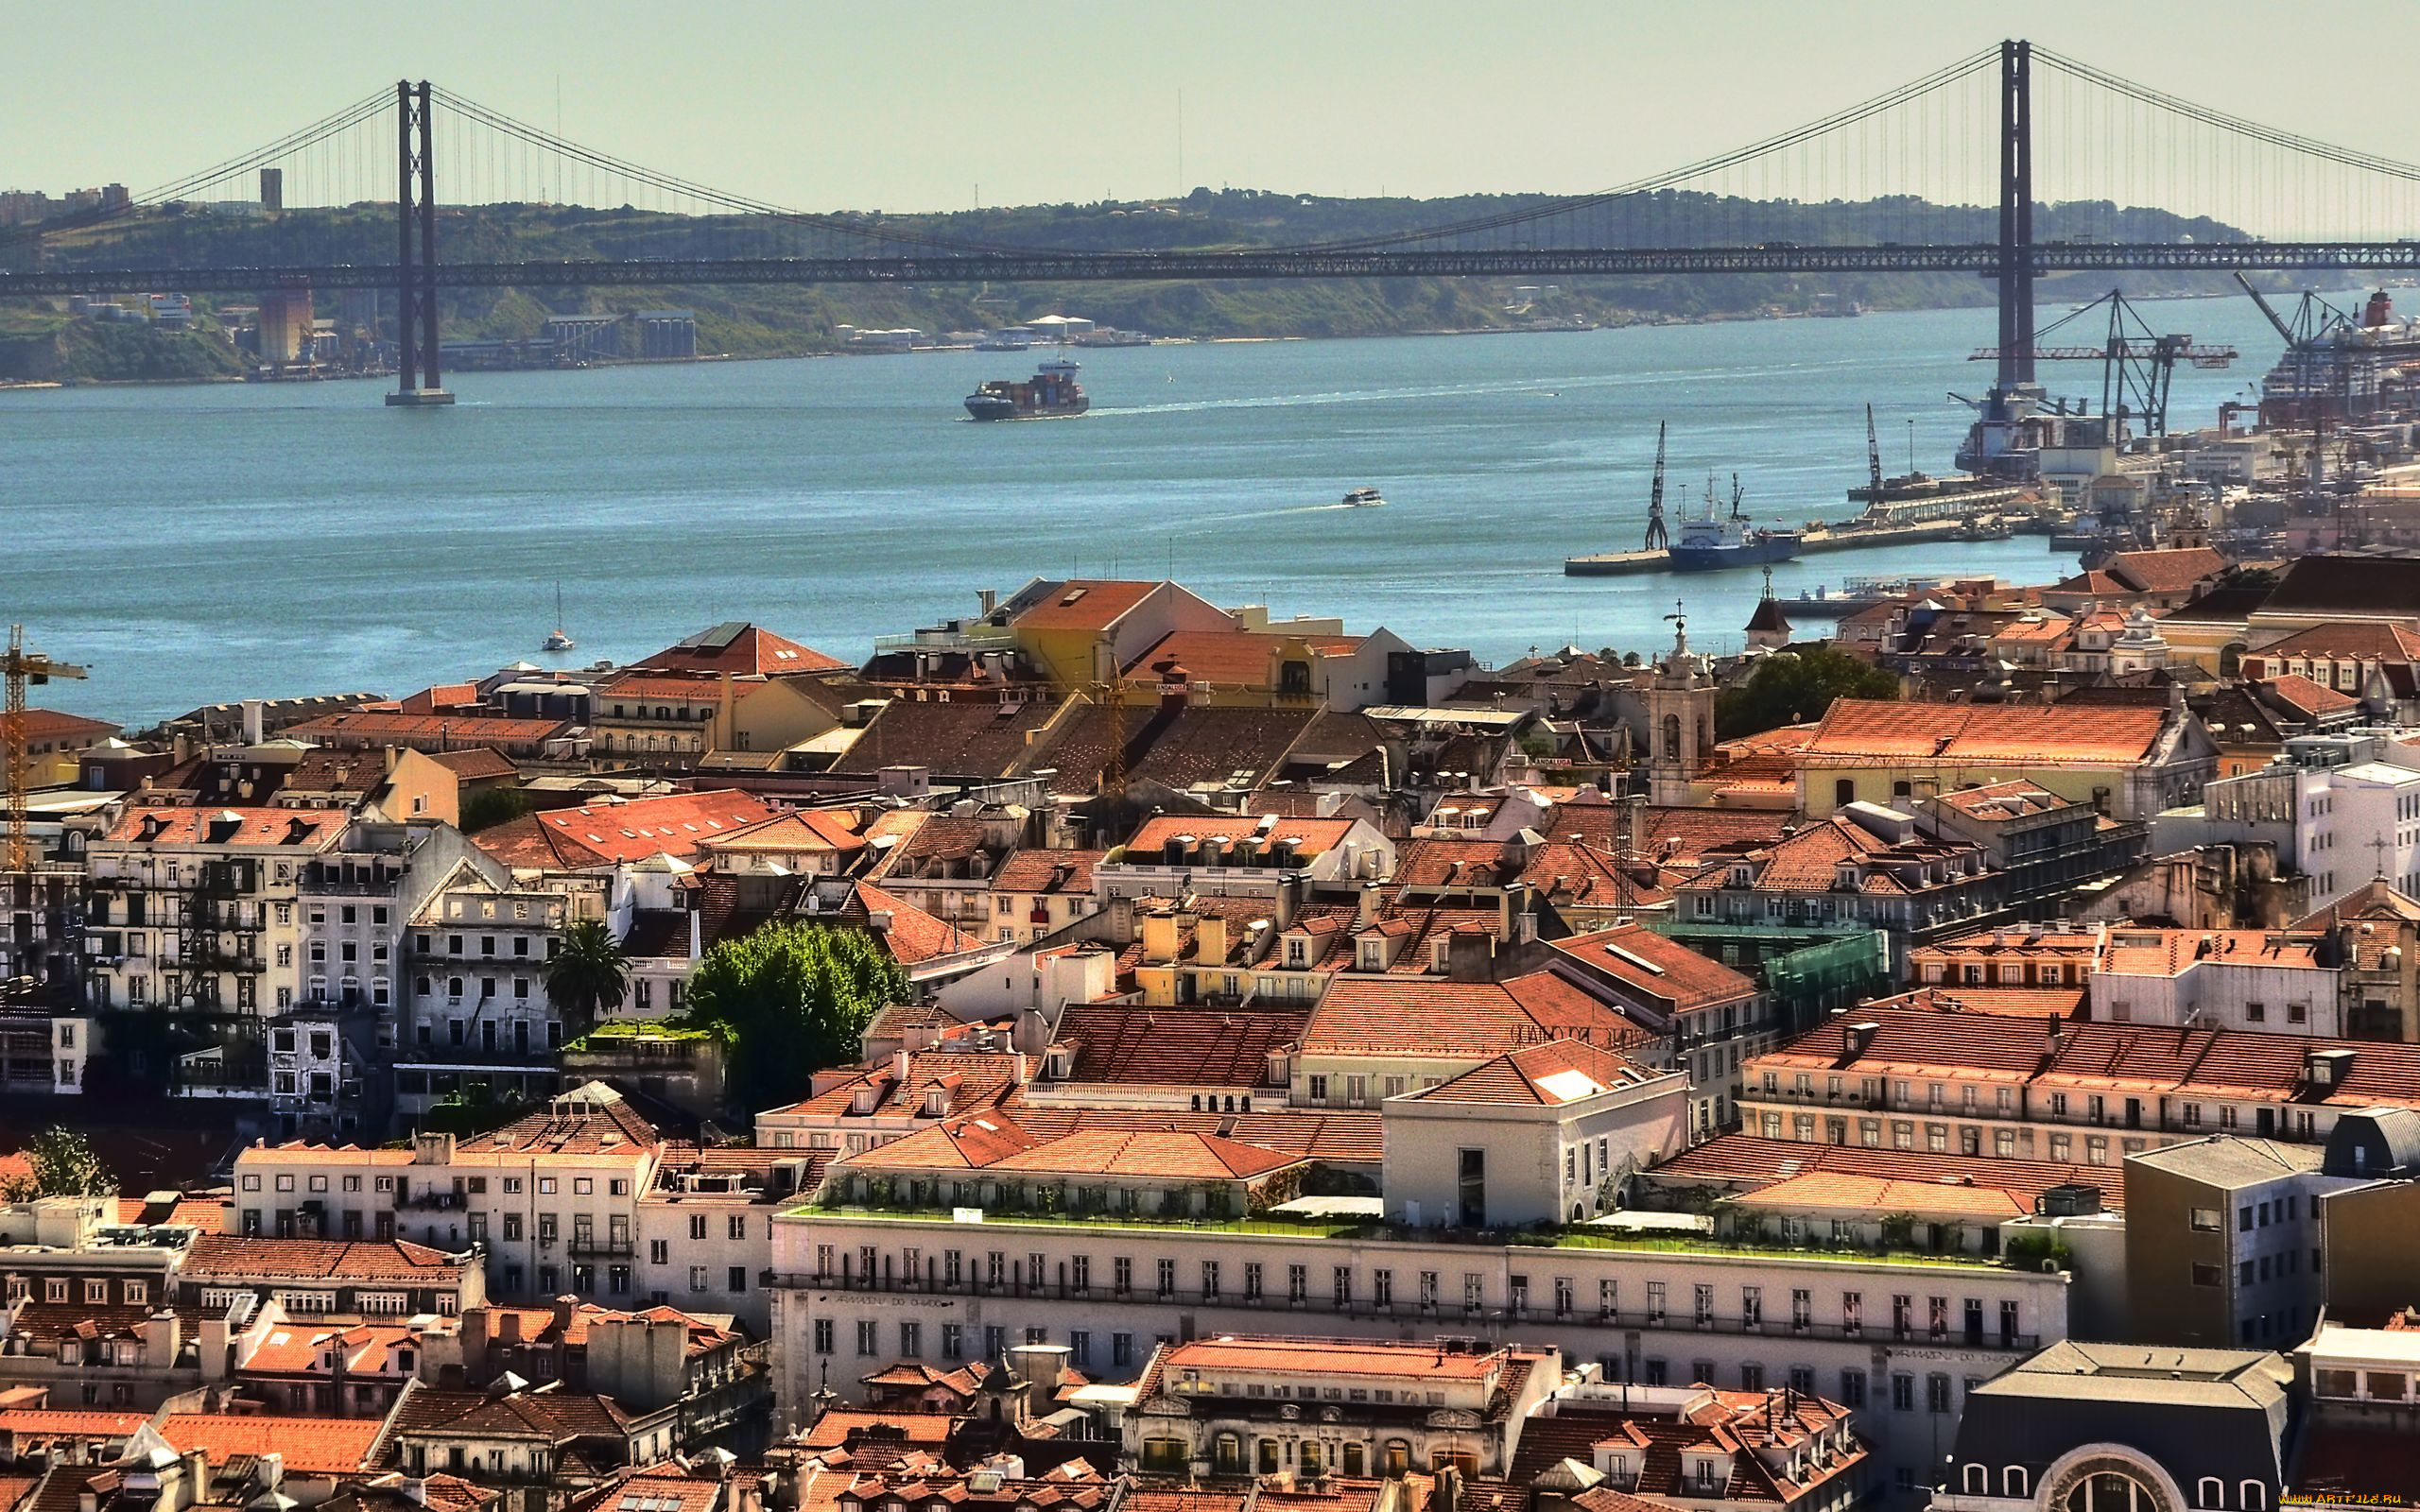 Картинки лиссабон на рабочий стол 1440, для